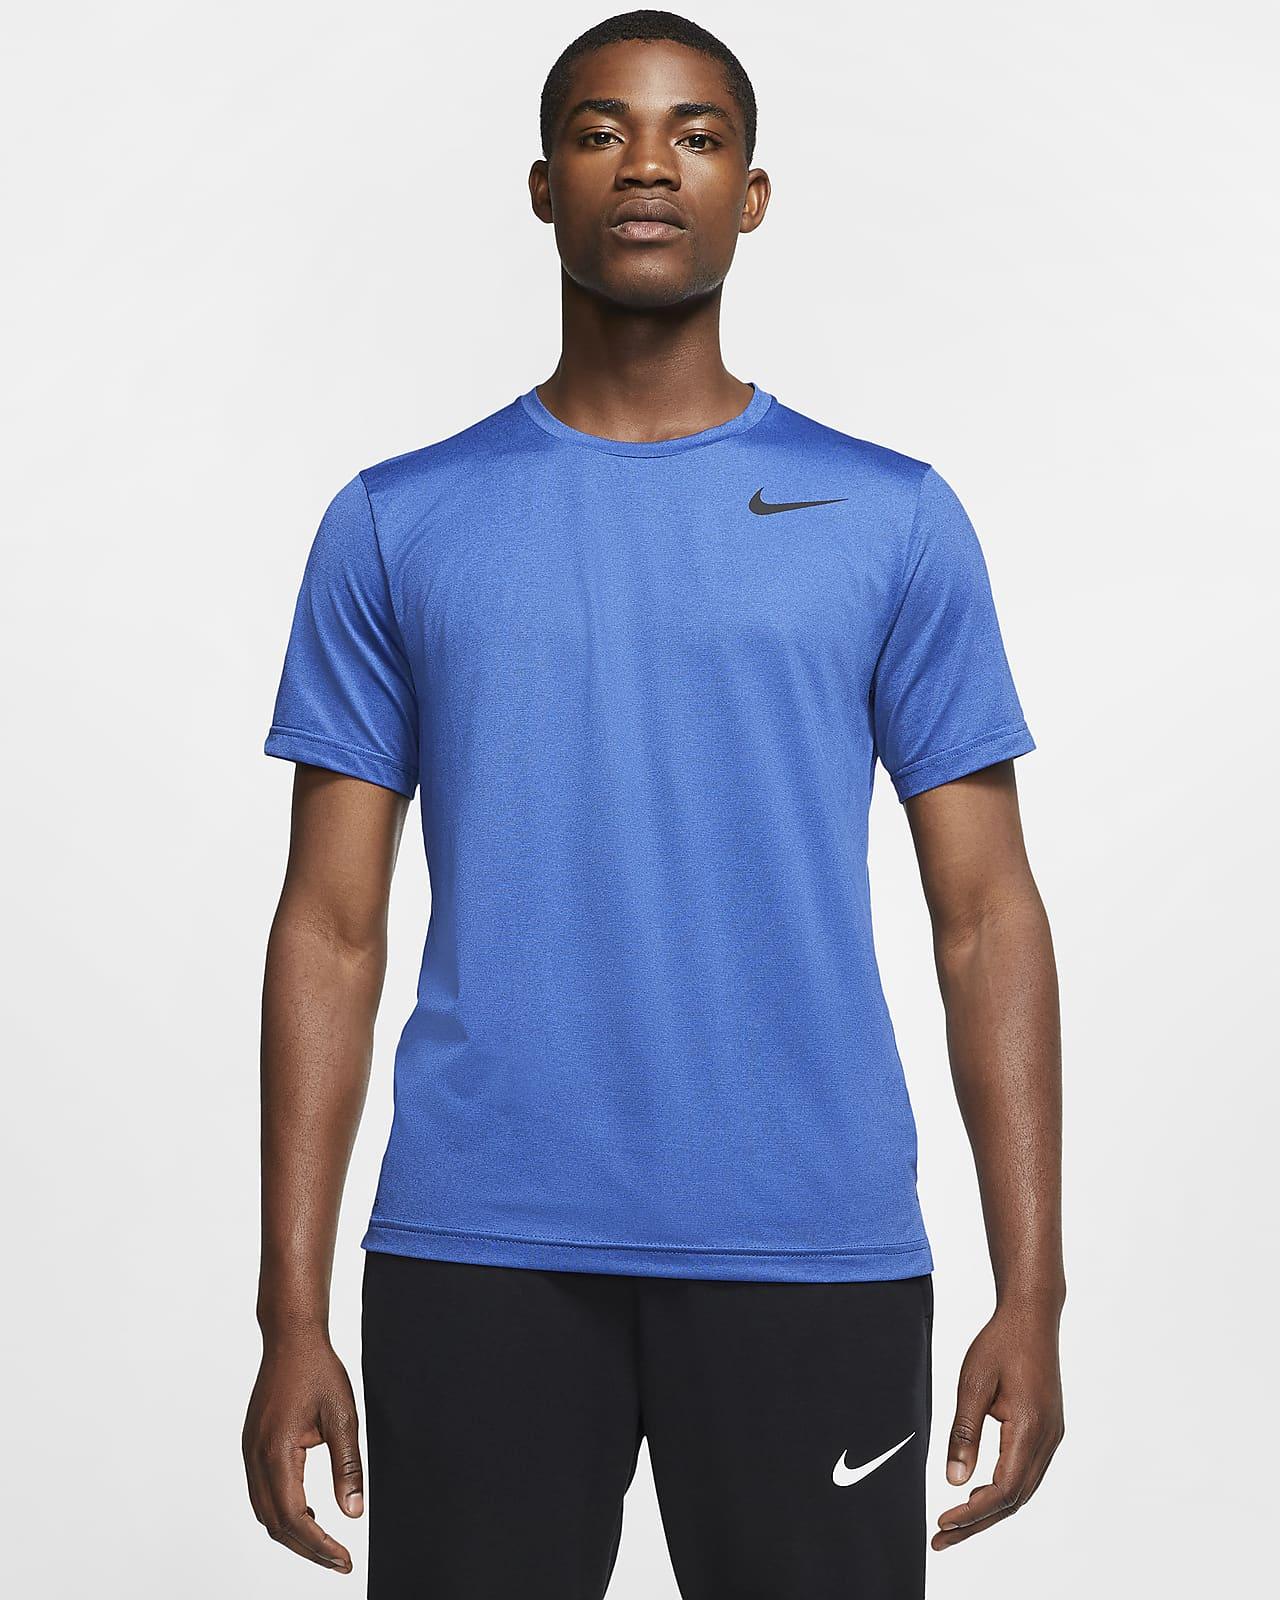 Мужская футболка с коротким рукавом Nike Pro